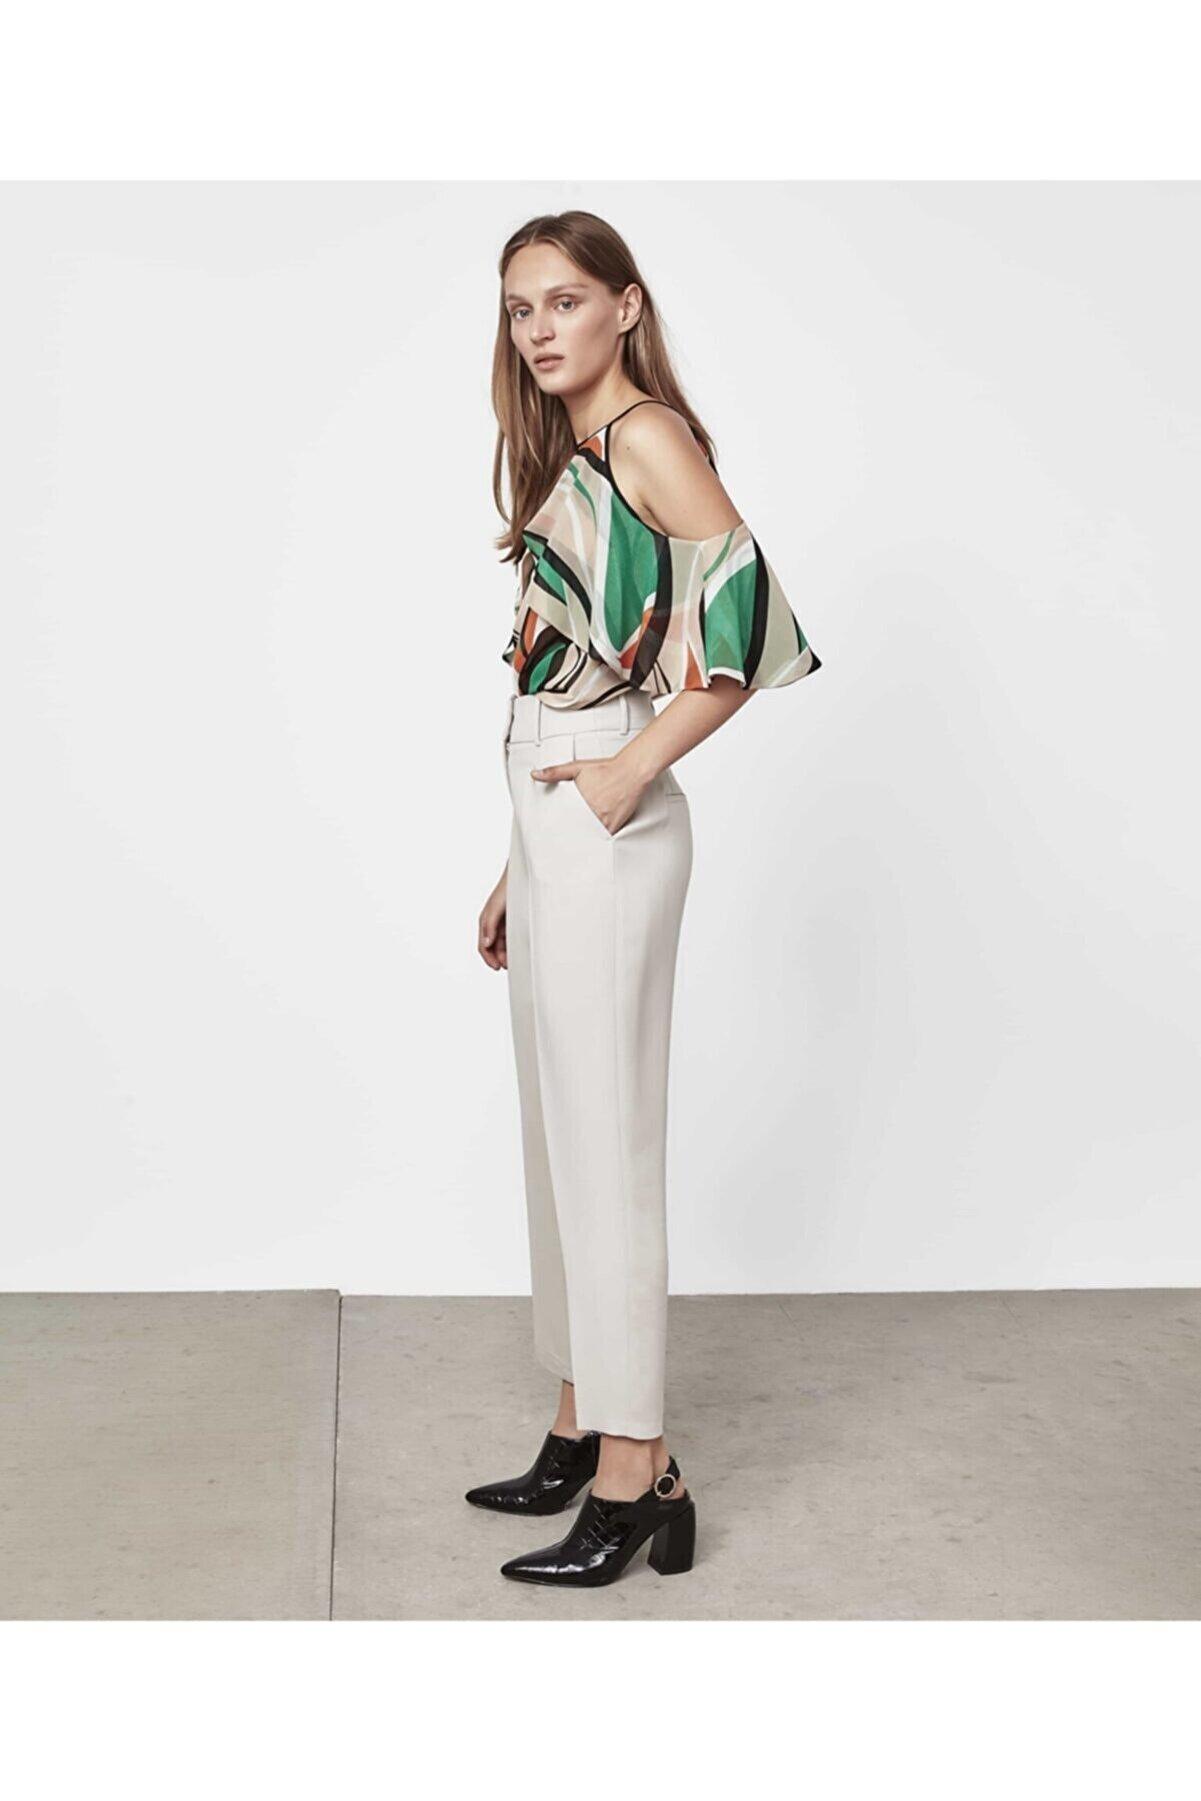 İpekyol Yüksek Bel Pilili Pantolon